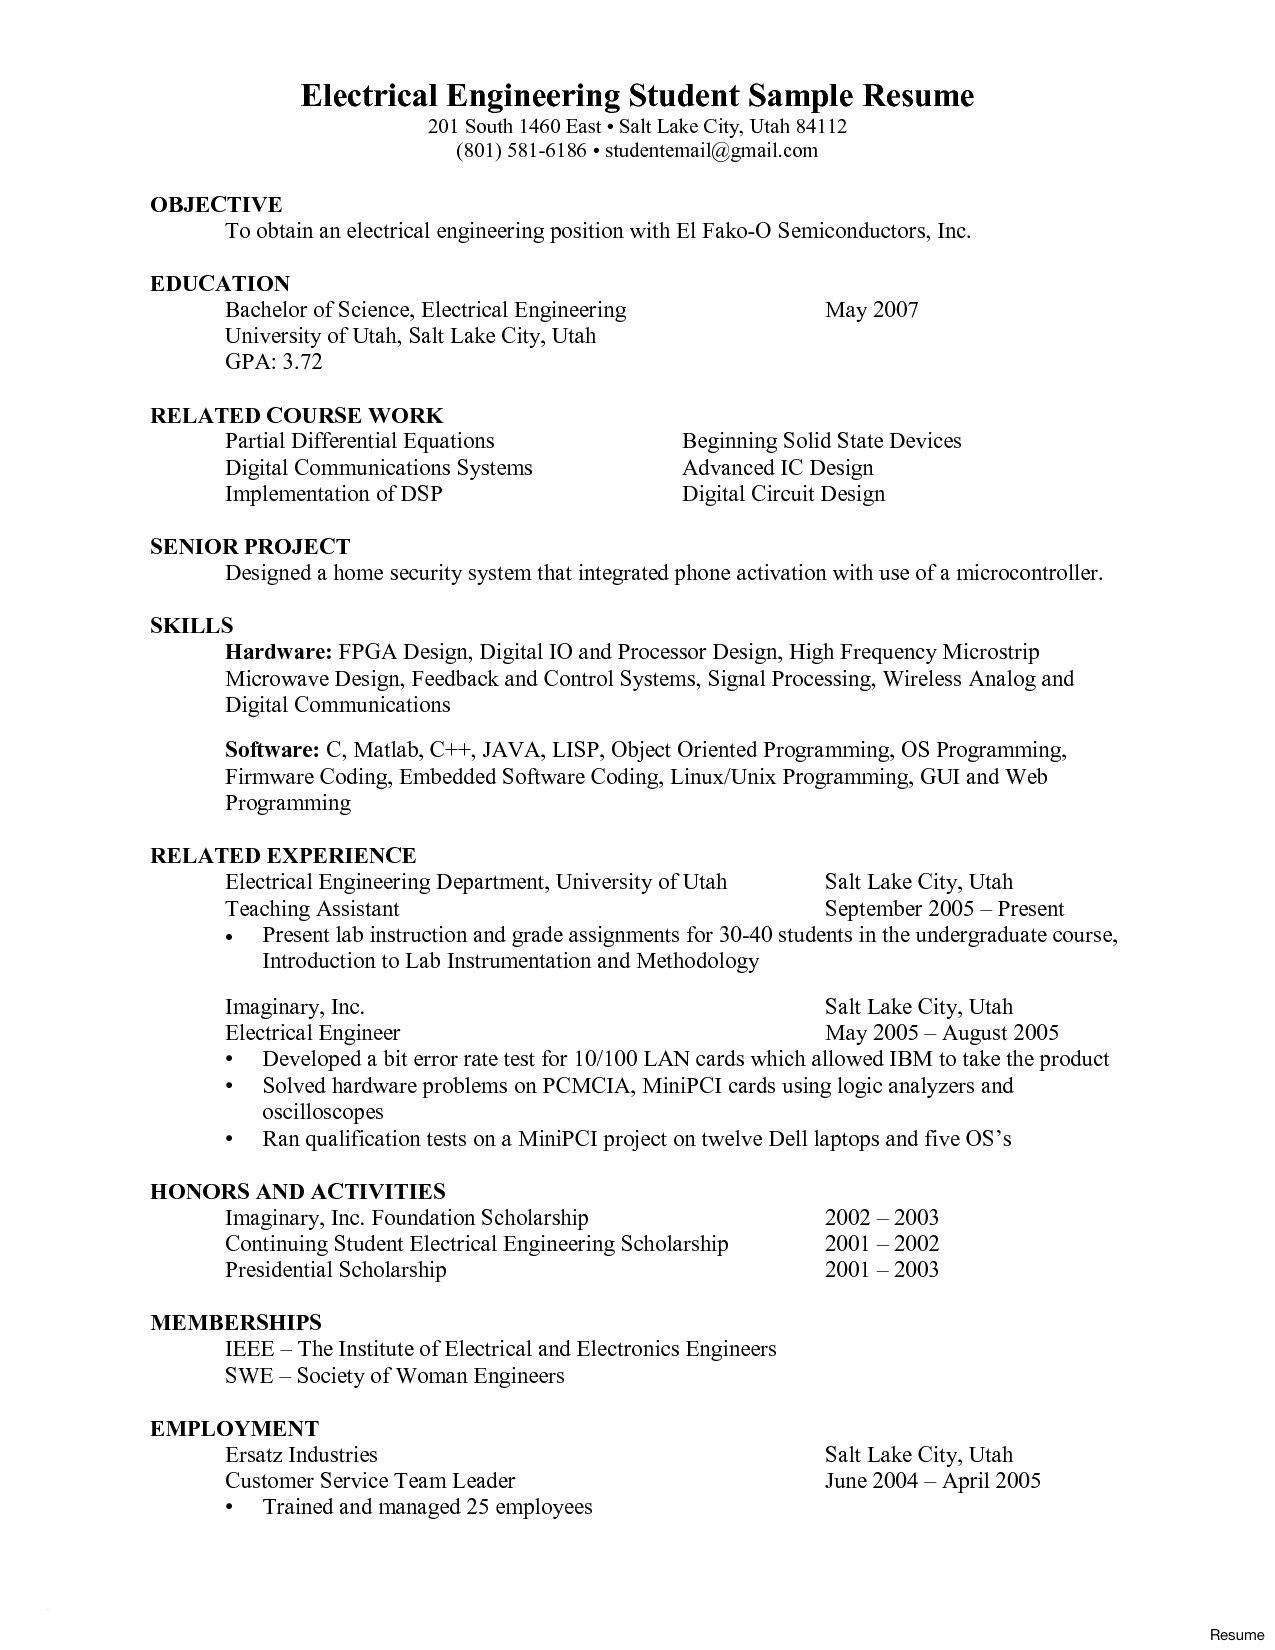 Senior Electrical Engineer Resume Template